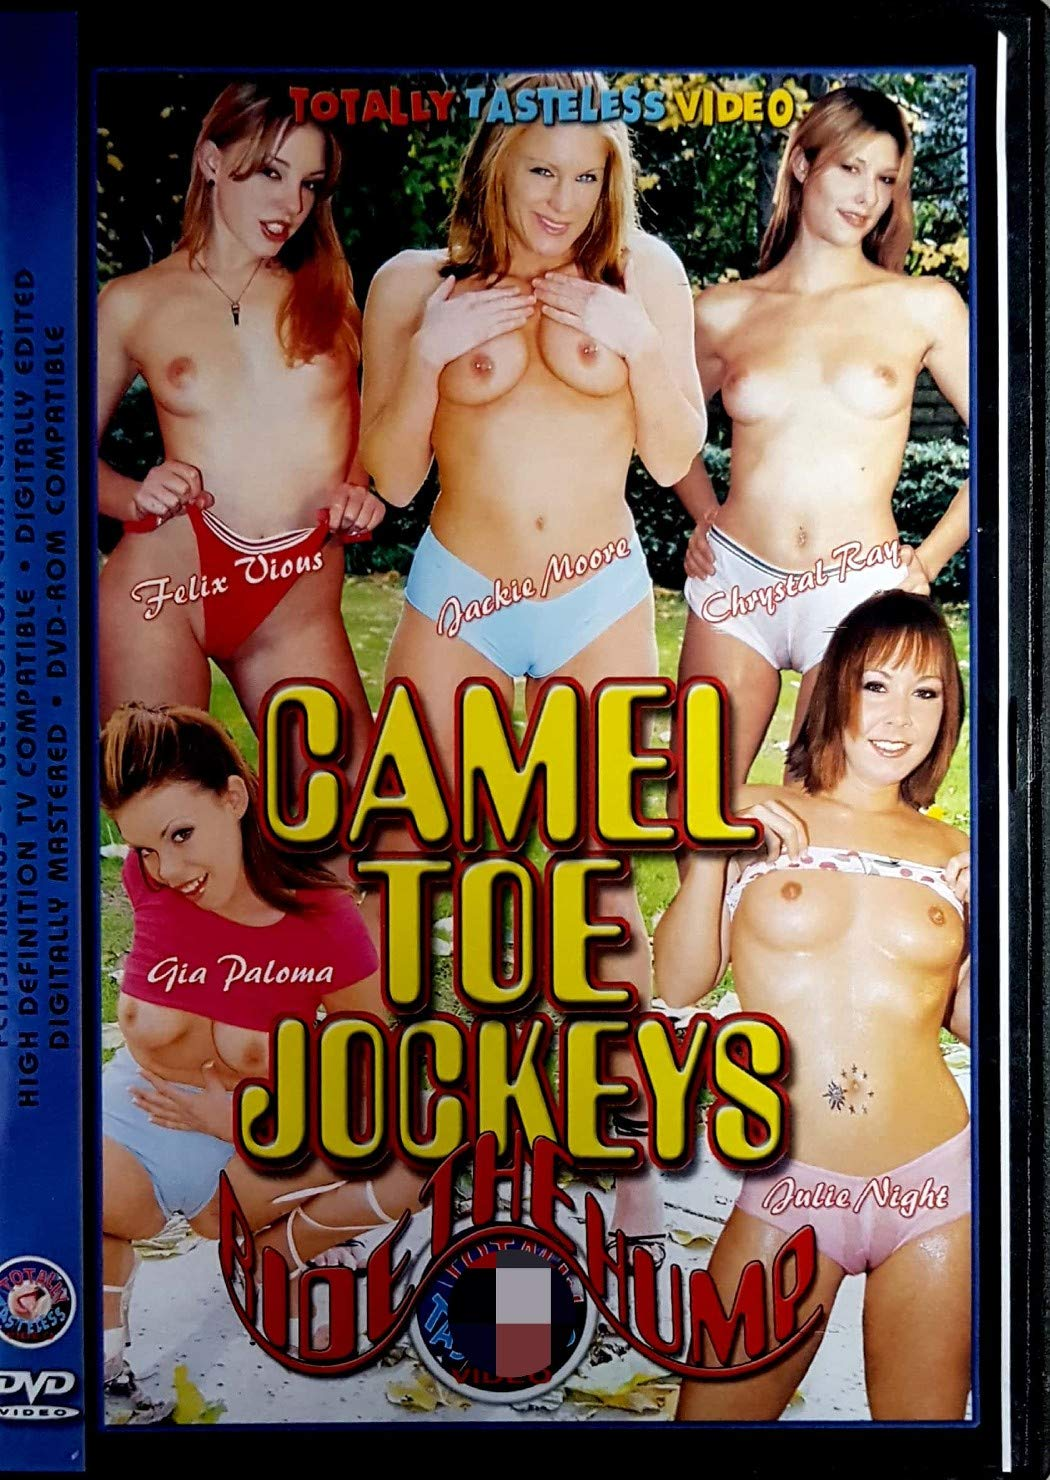 Sex camel toe sex